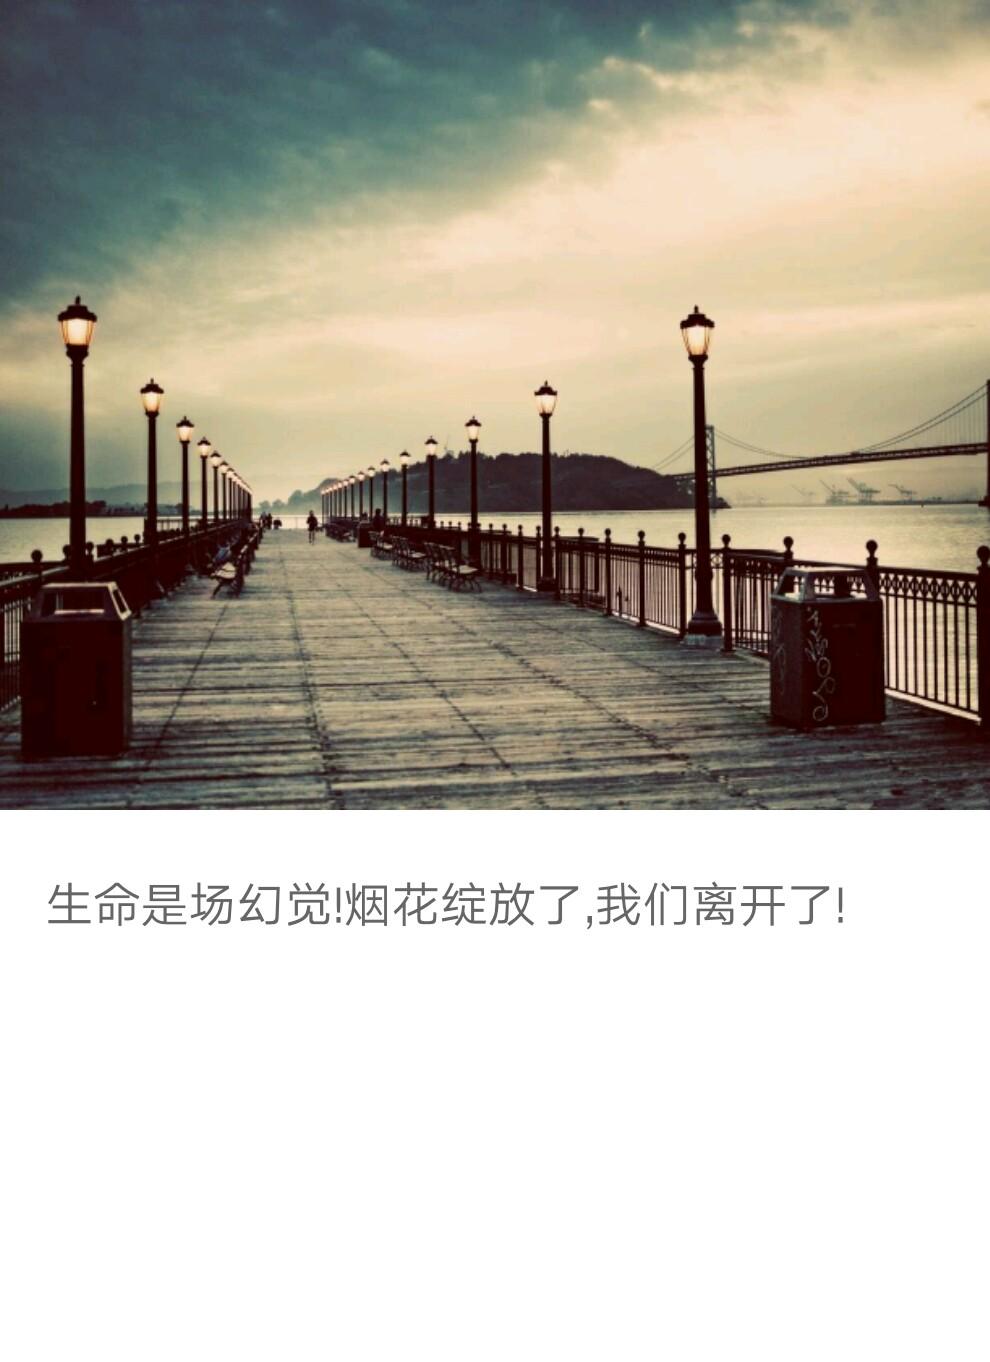 http://www.58100.com/pid/645286.html